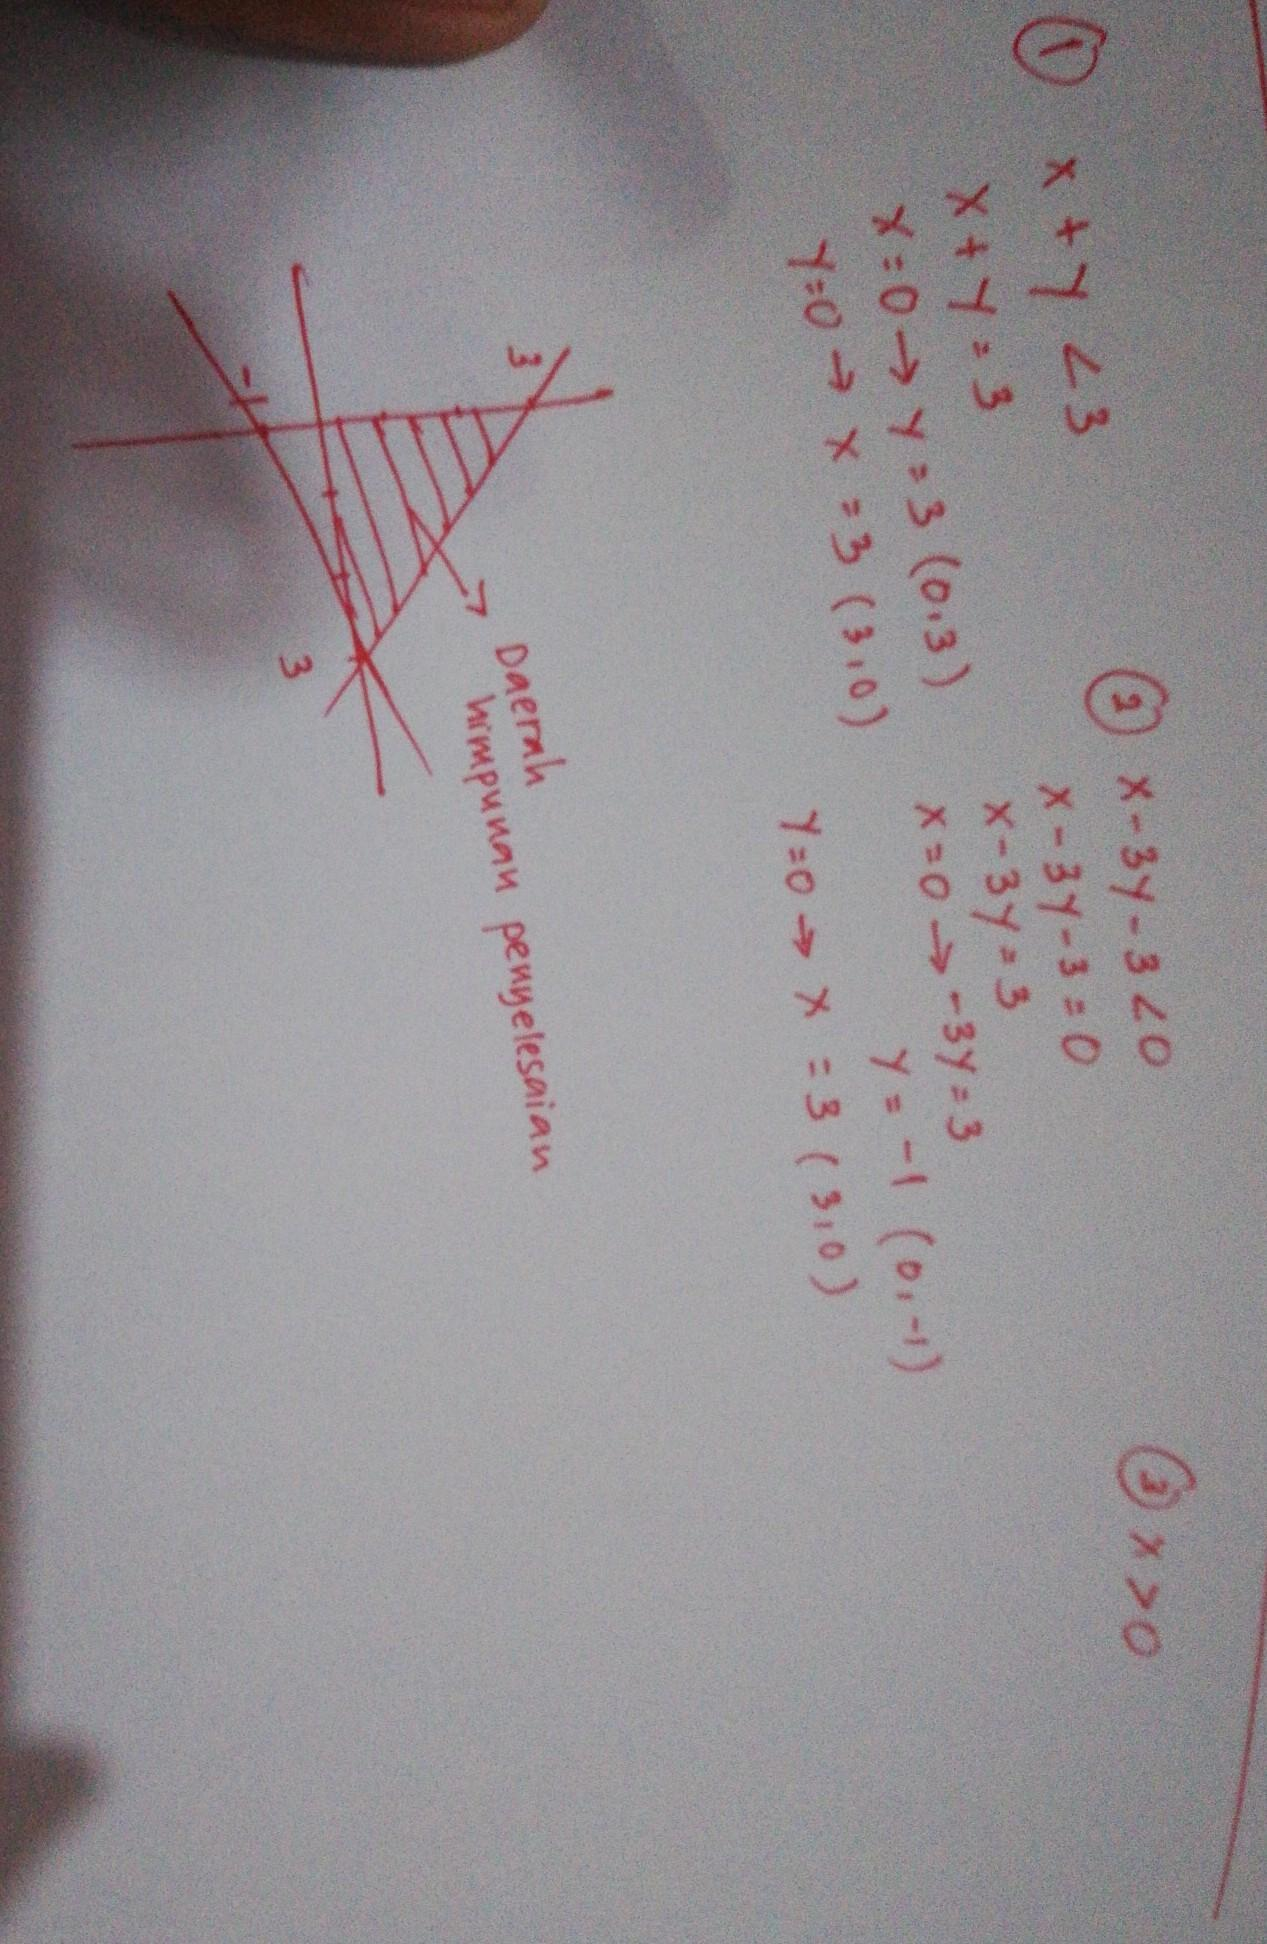 Tentukan Daerah Himpunan Penyelesaian Dari Sistem Pertidaksamaan Berikut : tentukan, daerah, himpunan, penyelesaian, sistem, pertidaksamaan, berikut, Tentukan, Daerah, Himpunan, Penyelesaian, Sistem, Pertidaksamaan, Linear, X+y<3,x-3y-3<0,, Brainly.co.id